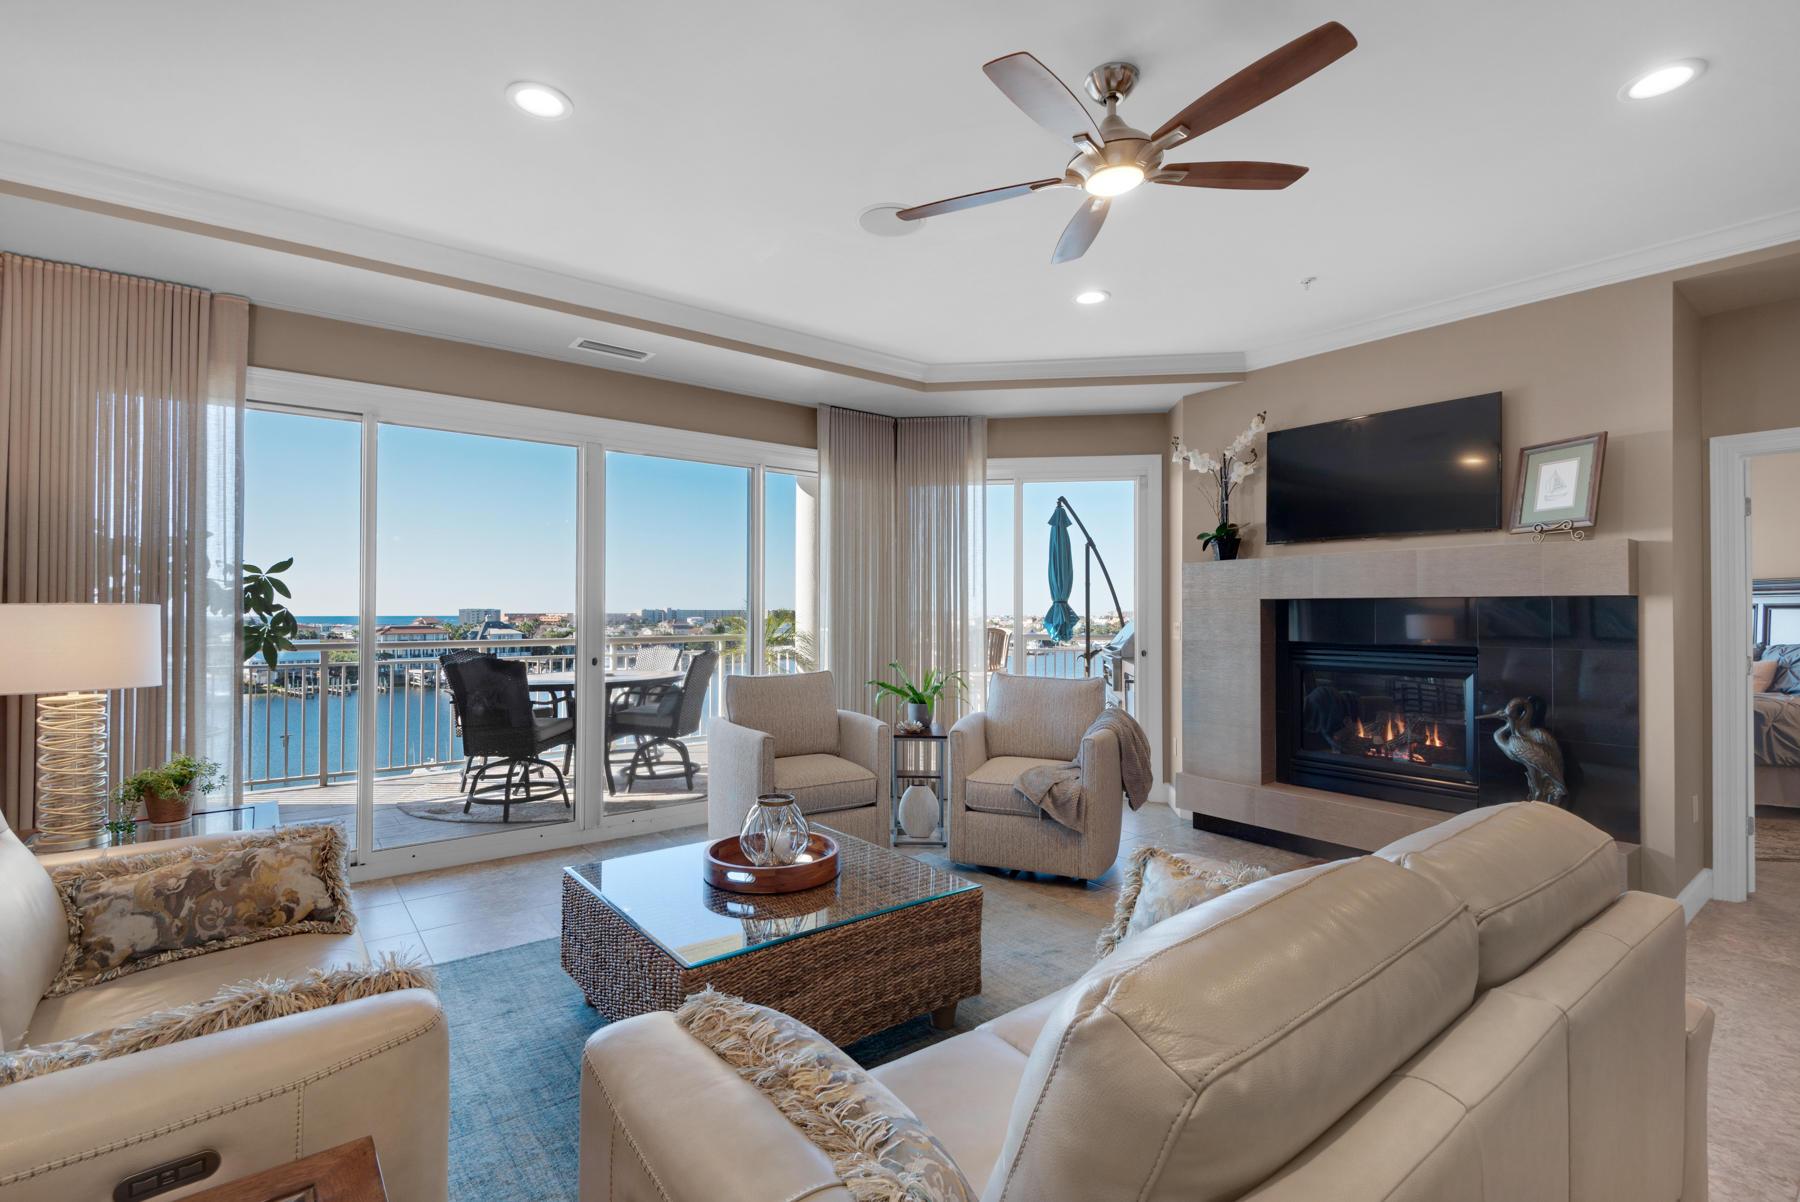 A 3 Bedroom 3 Bedroom Grand Harbor Condominium